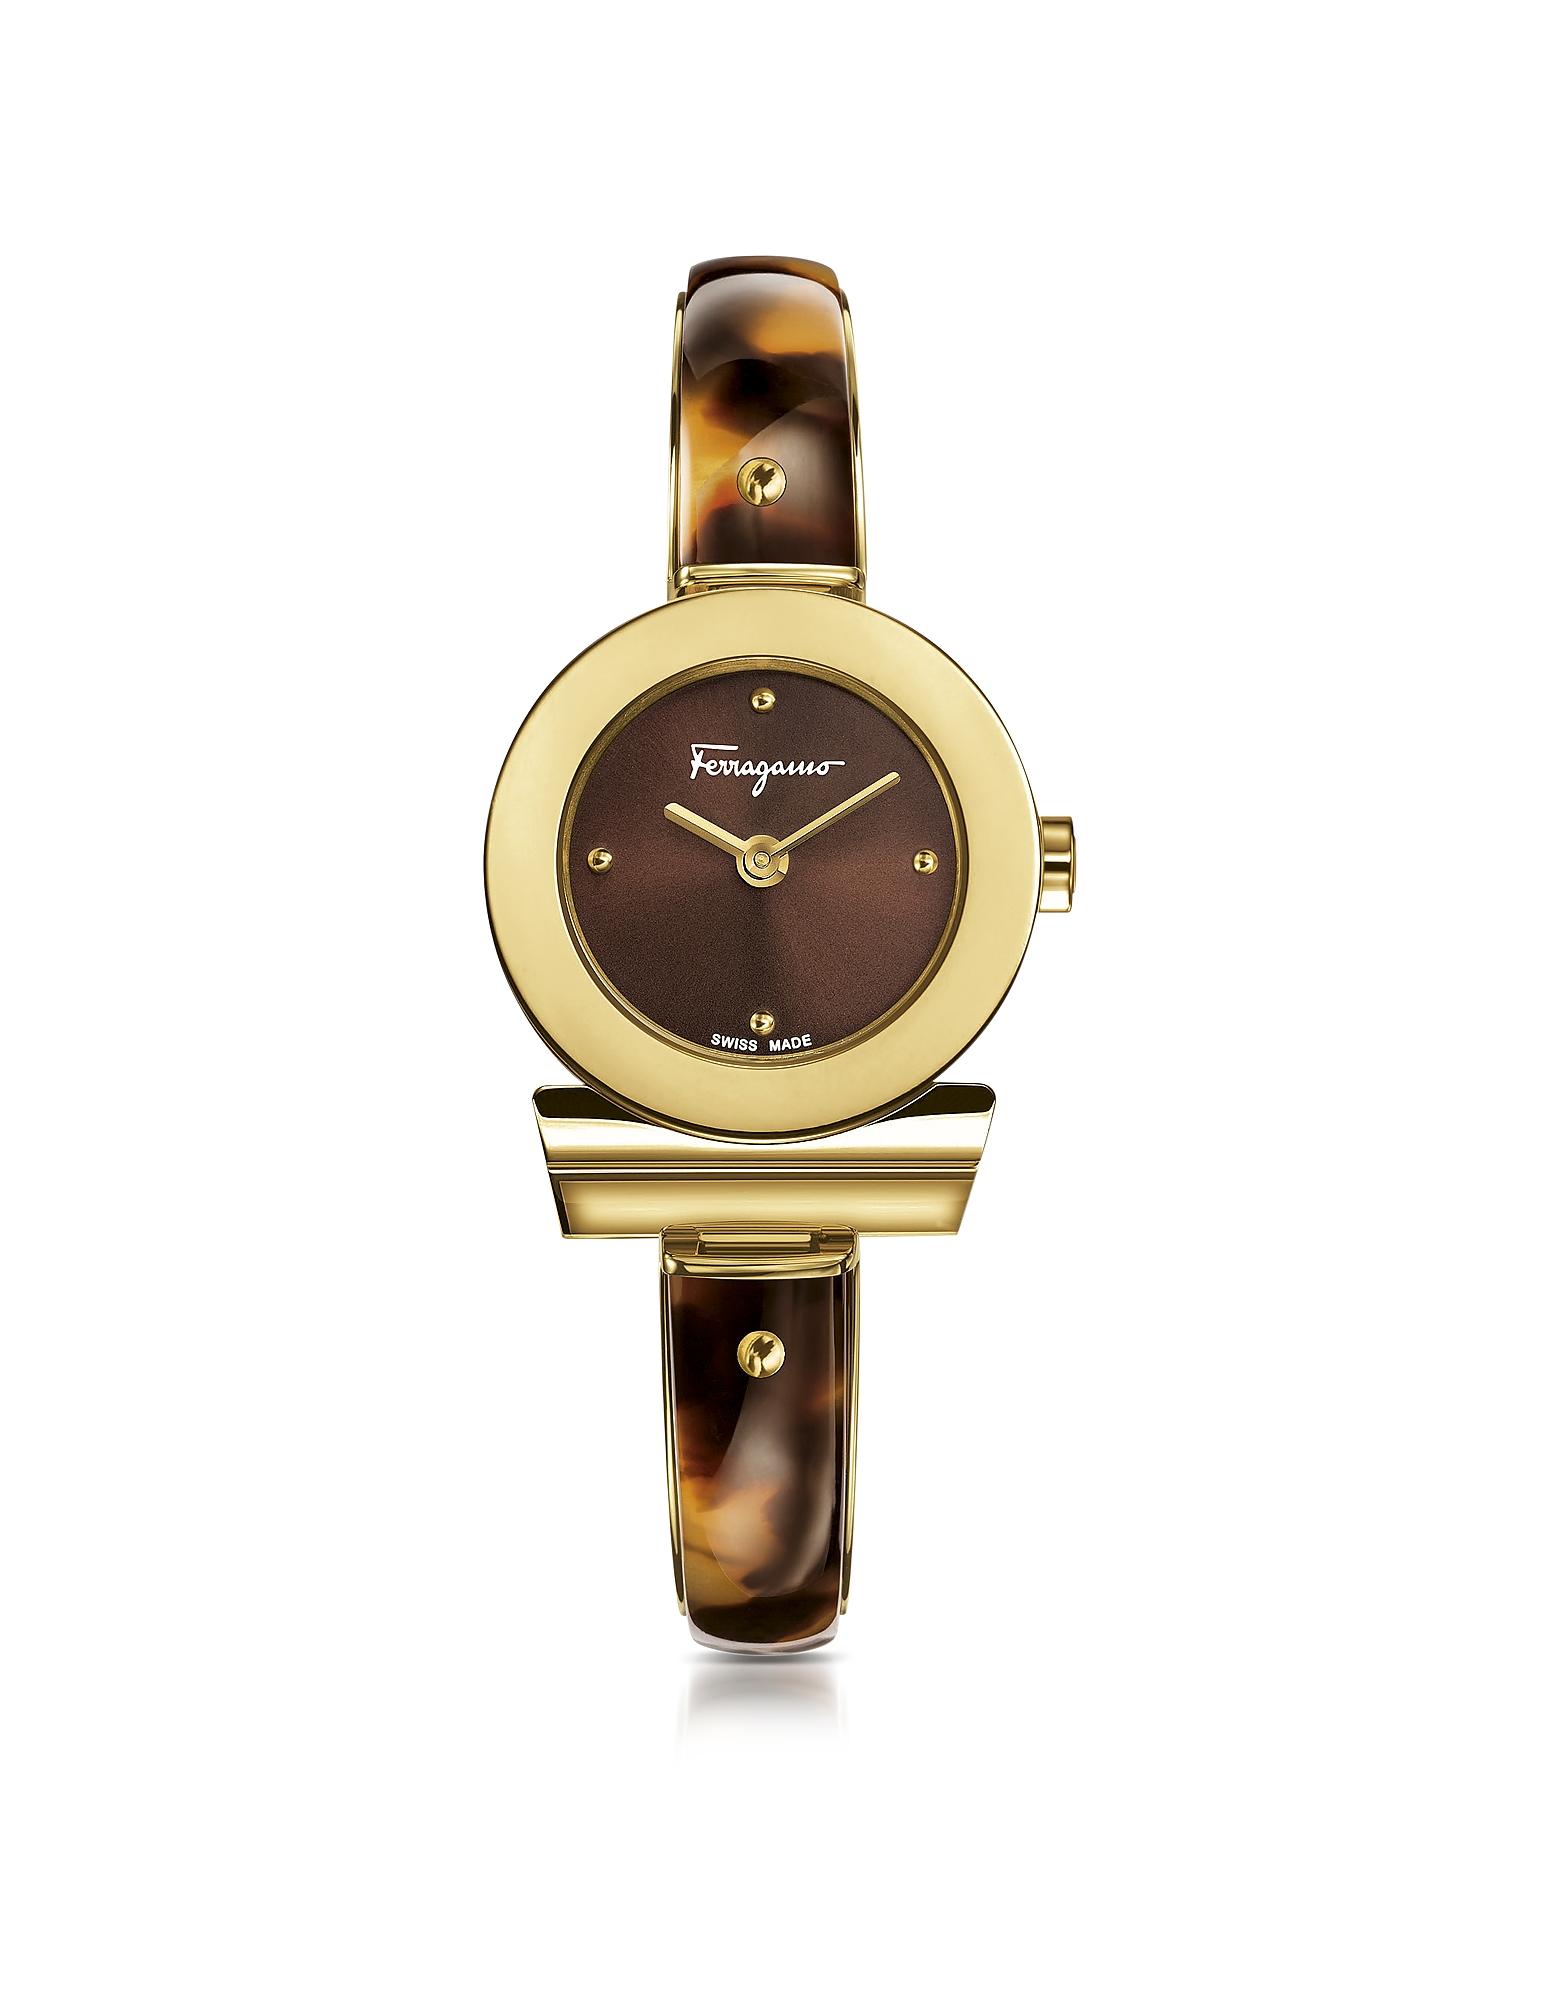 Salvatore Ferragamo Women's Watches, Gancino Gold IP Stainless Steel and Brown Acetate Women's Watch